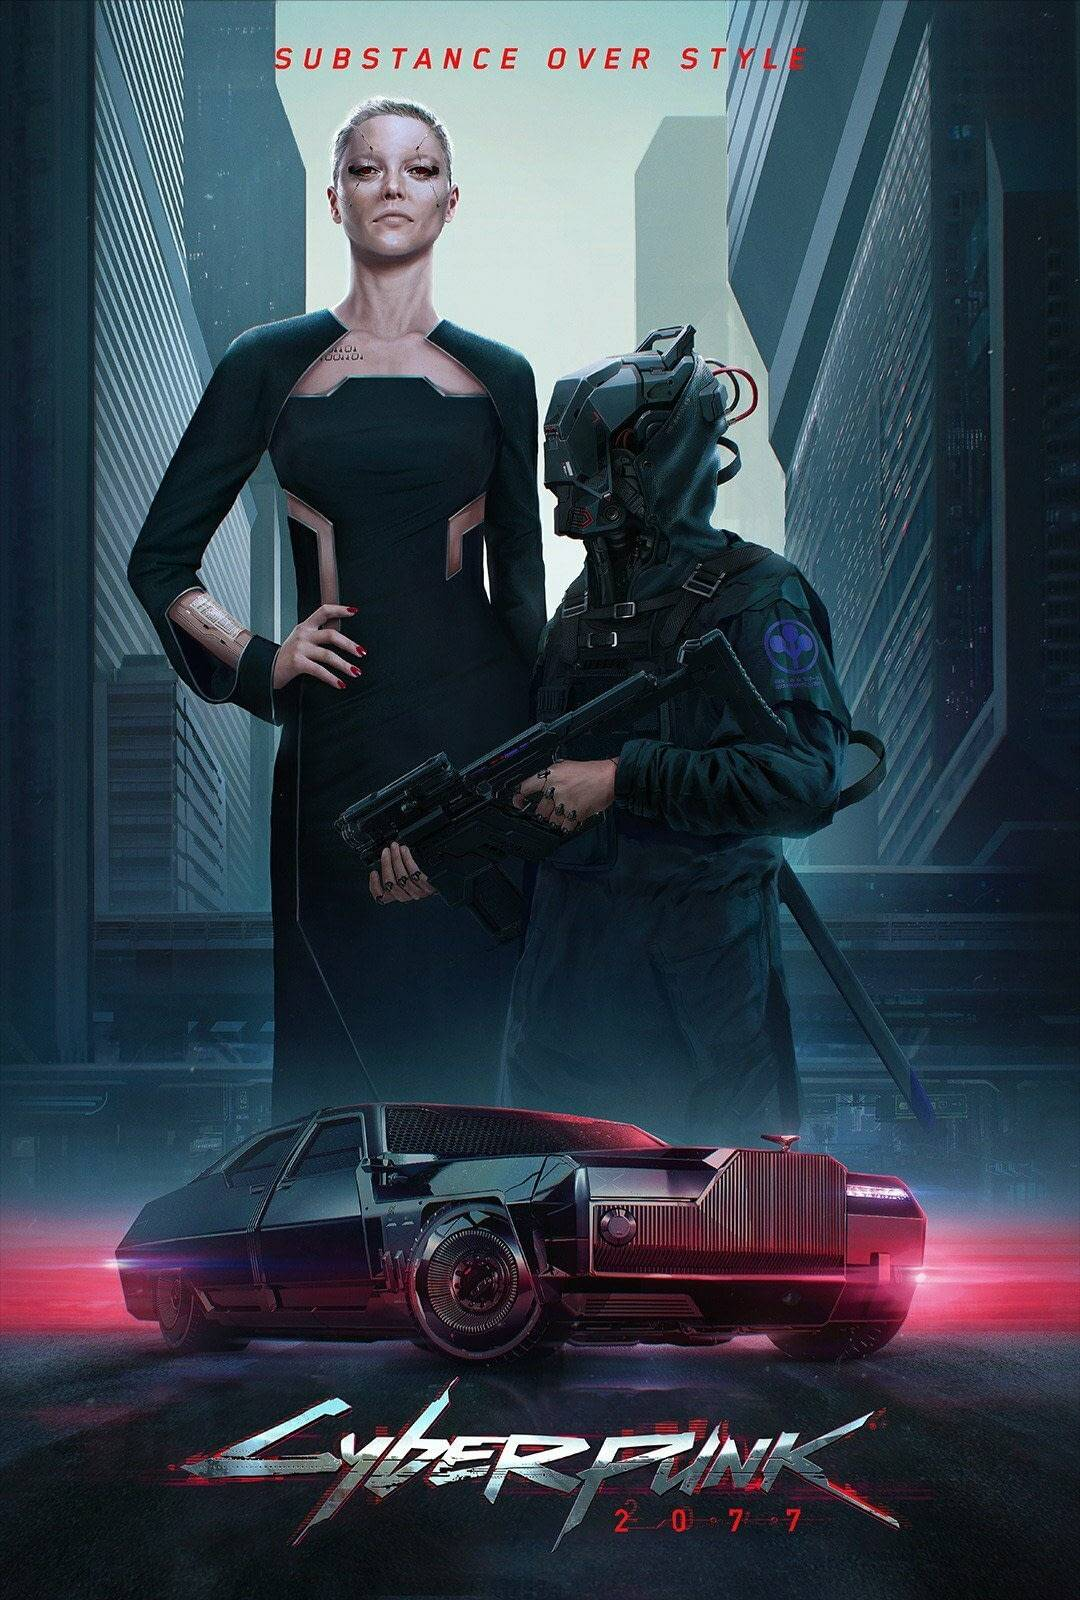 Стили Cyberpunk 2077 в одежде и архитектуре 3